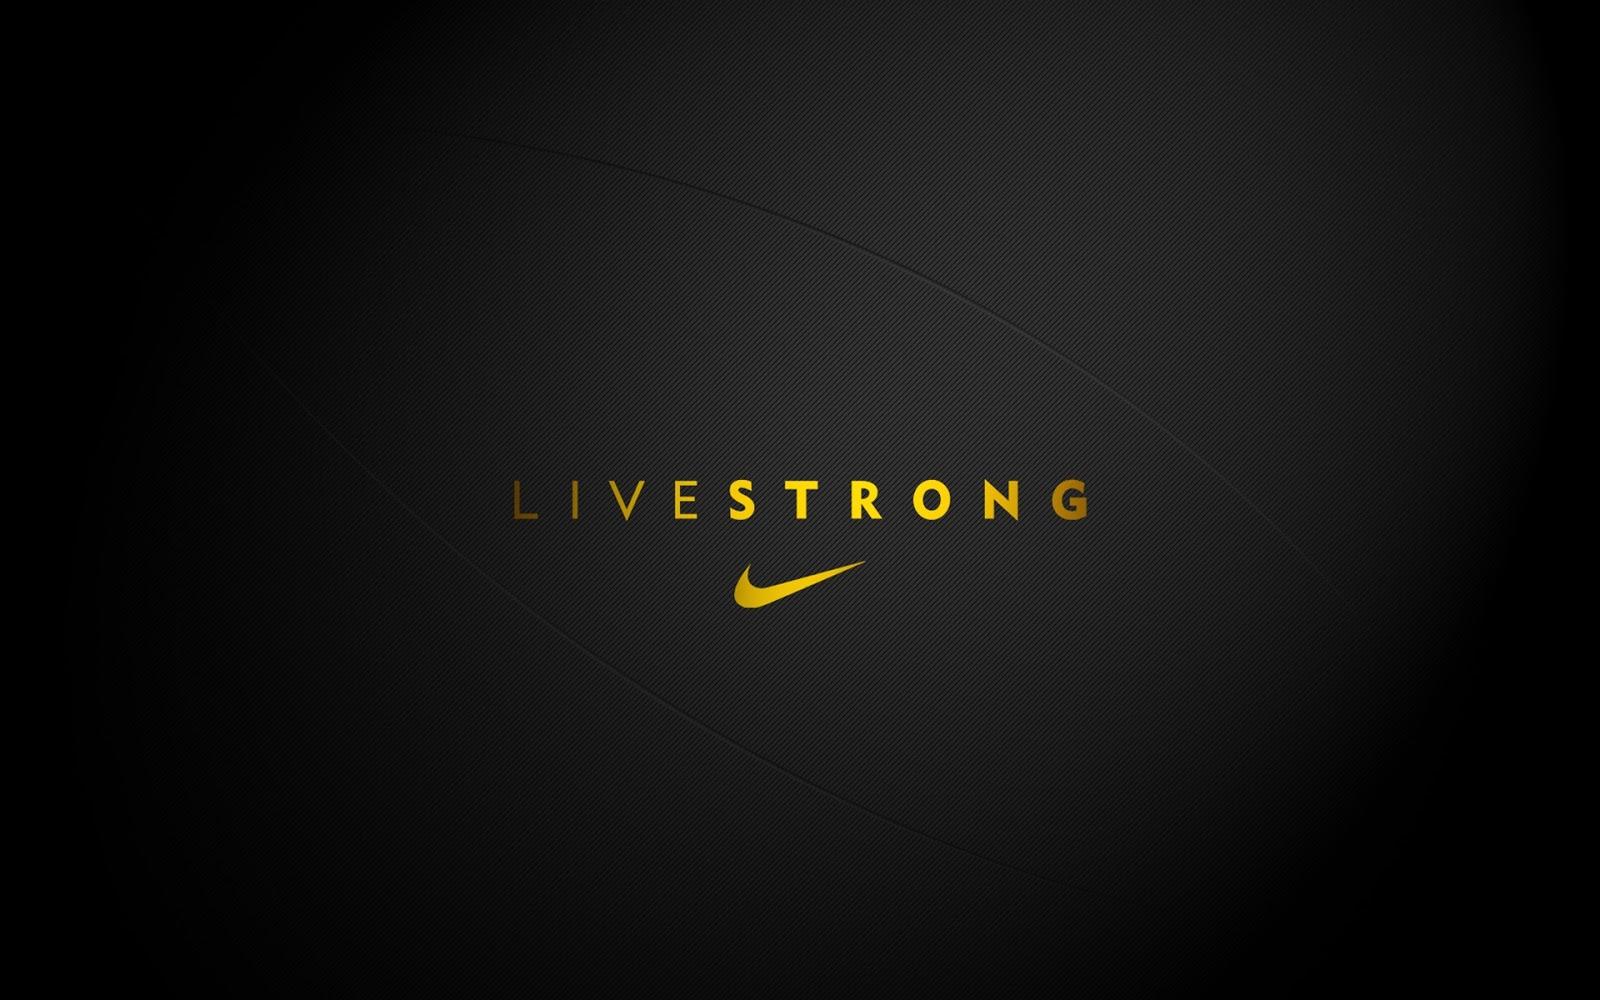 Cool Nike Iphone Wallpaper Nike hd wallpaper 1080p 1600x1000